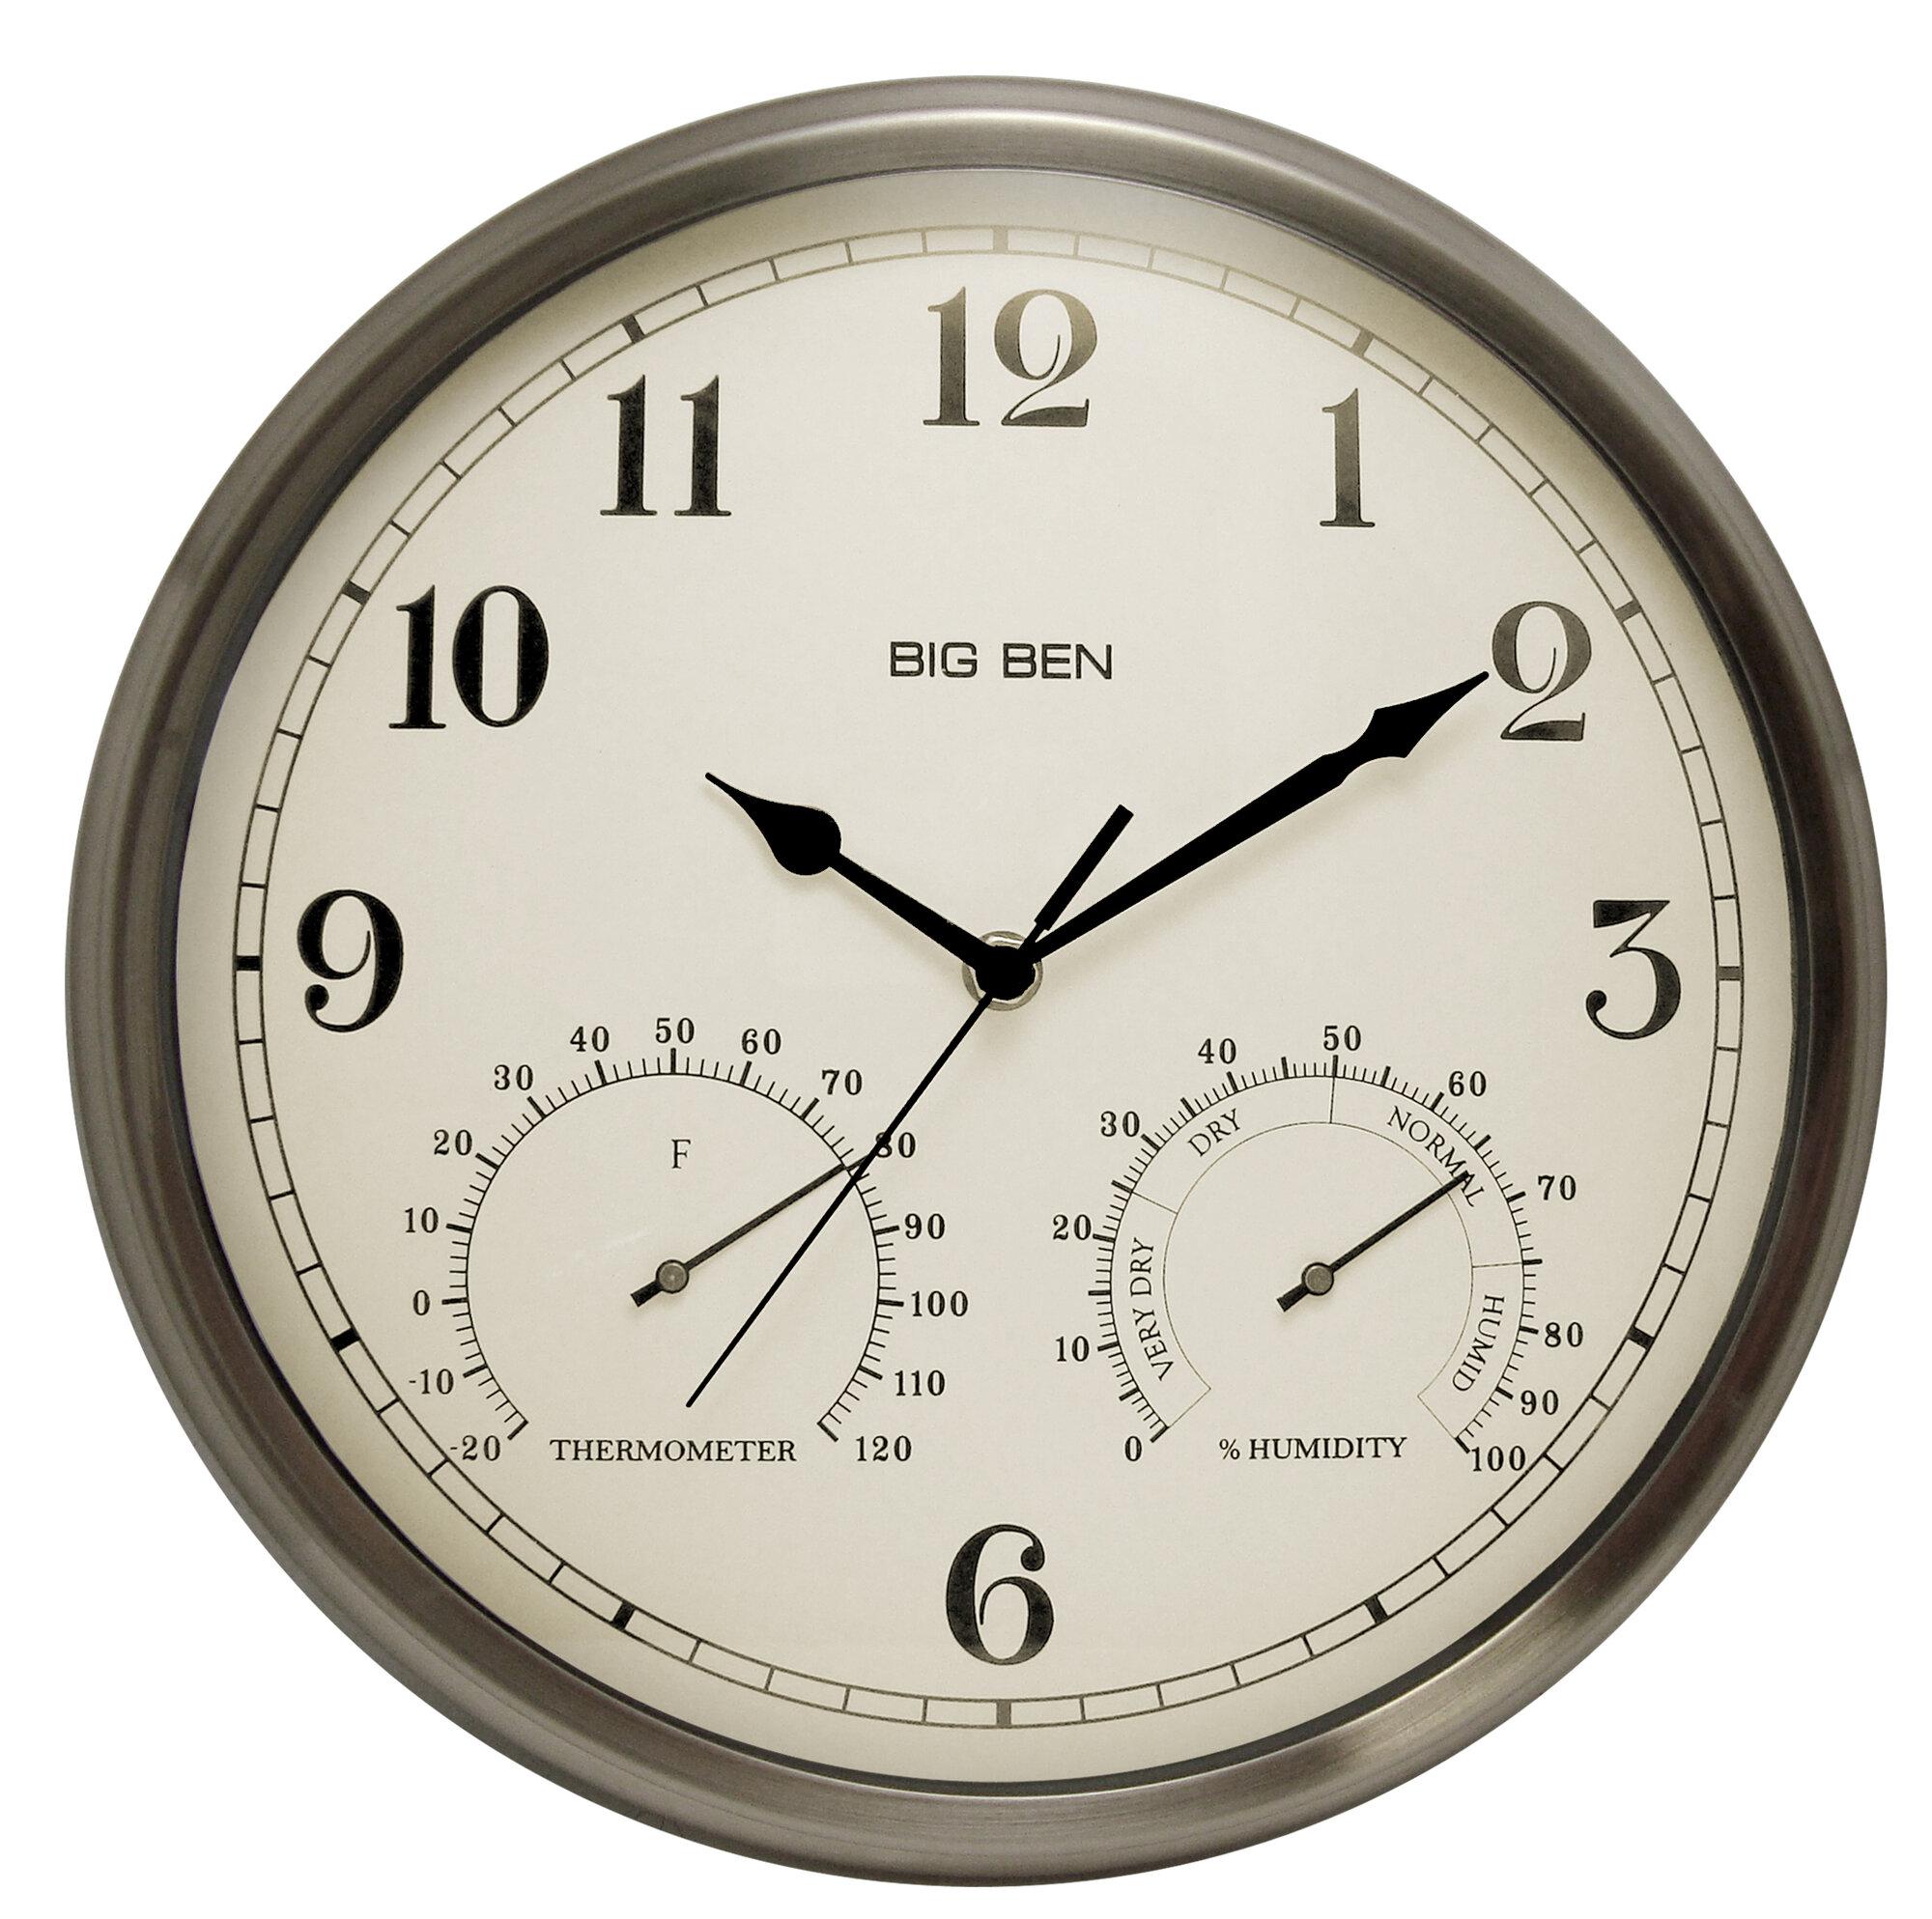 Westclox Clocks Big Ben 12 Quot Round Metal Frame Outdoor Wall